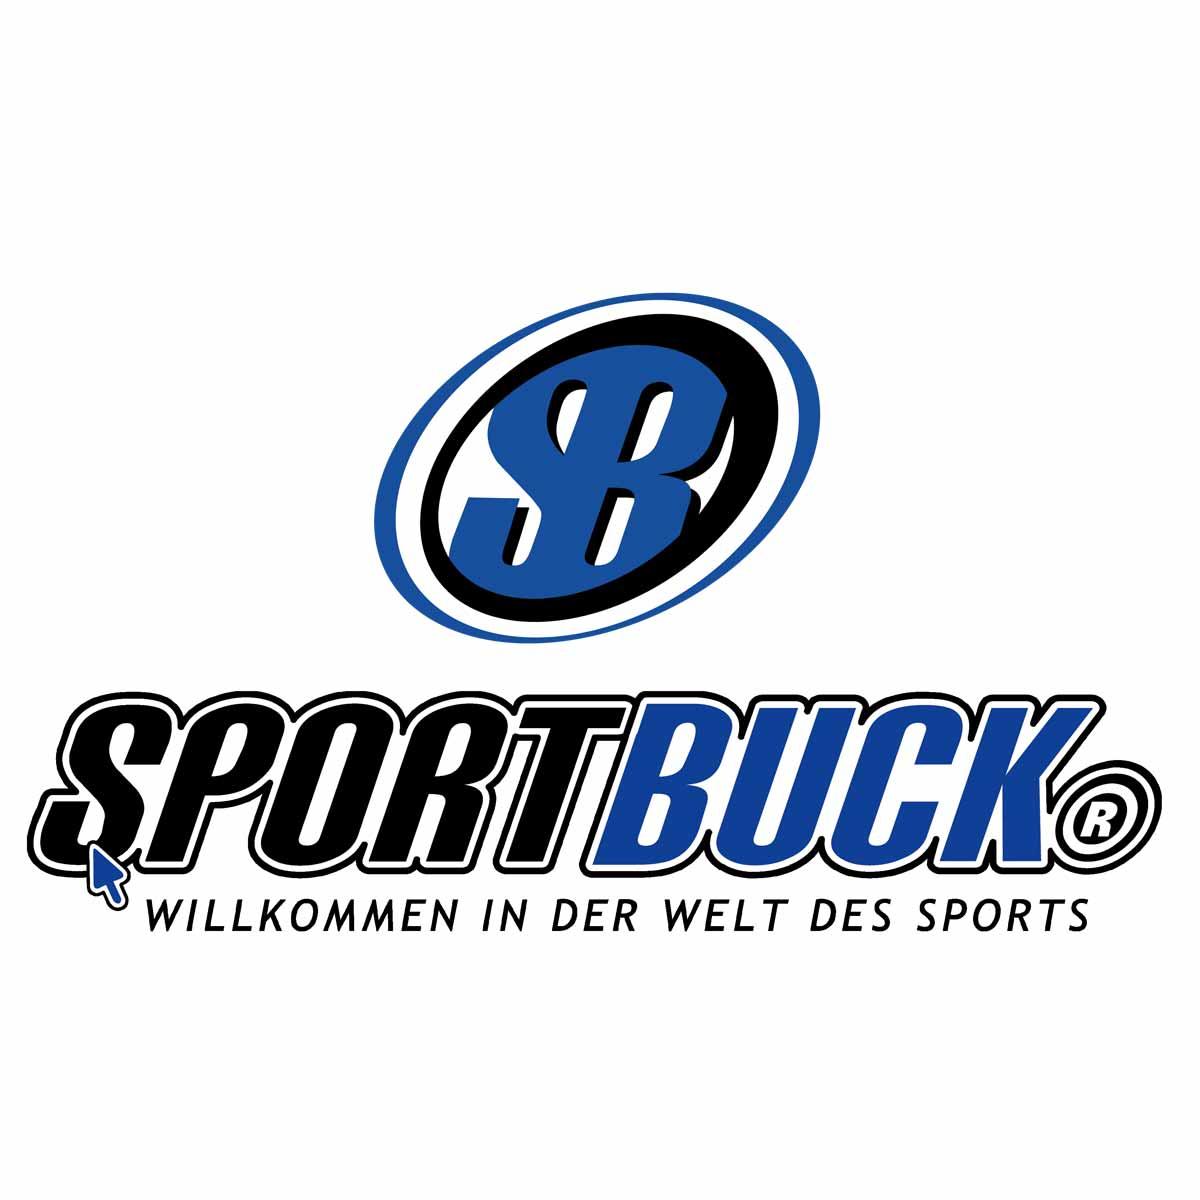 Whey Isolate 94 Molkenproteinisolat Eiweißpulver 850g Banane - Mindesthaltbarkeitsdatum 11/2022